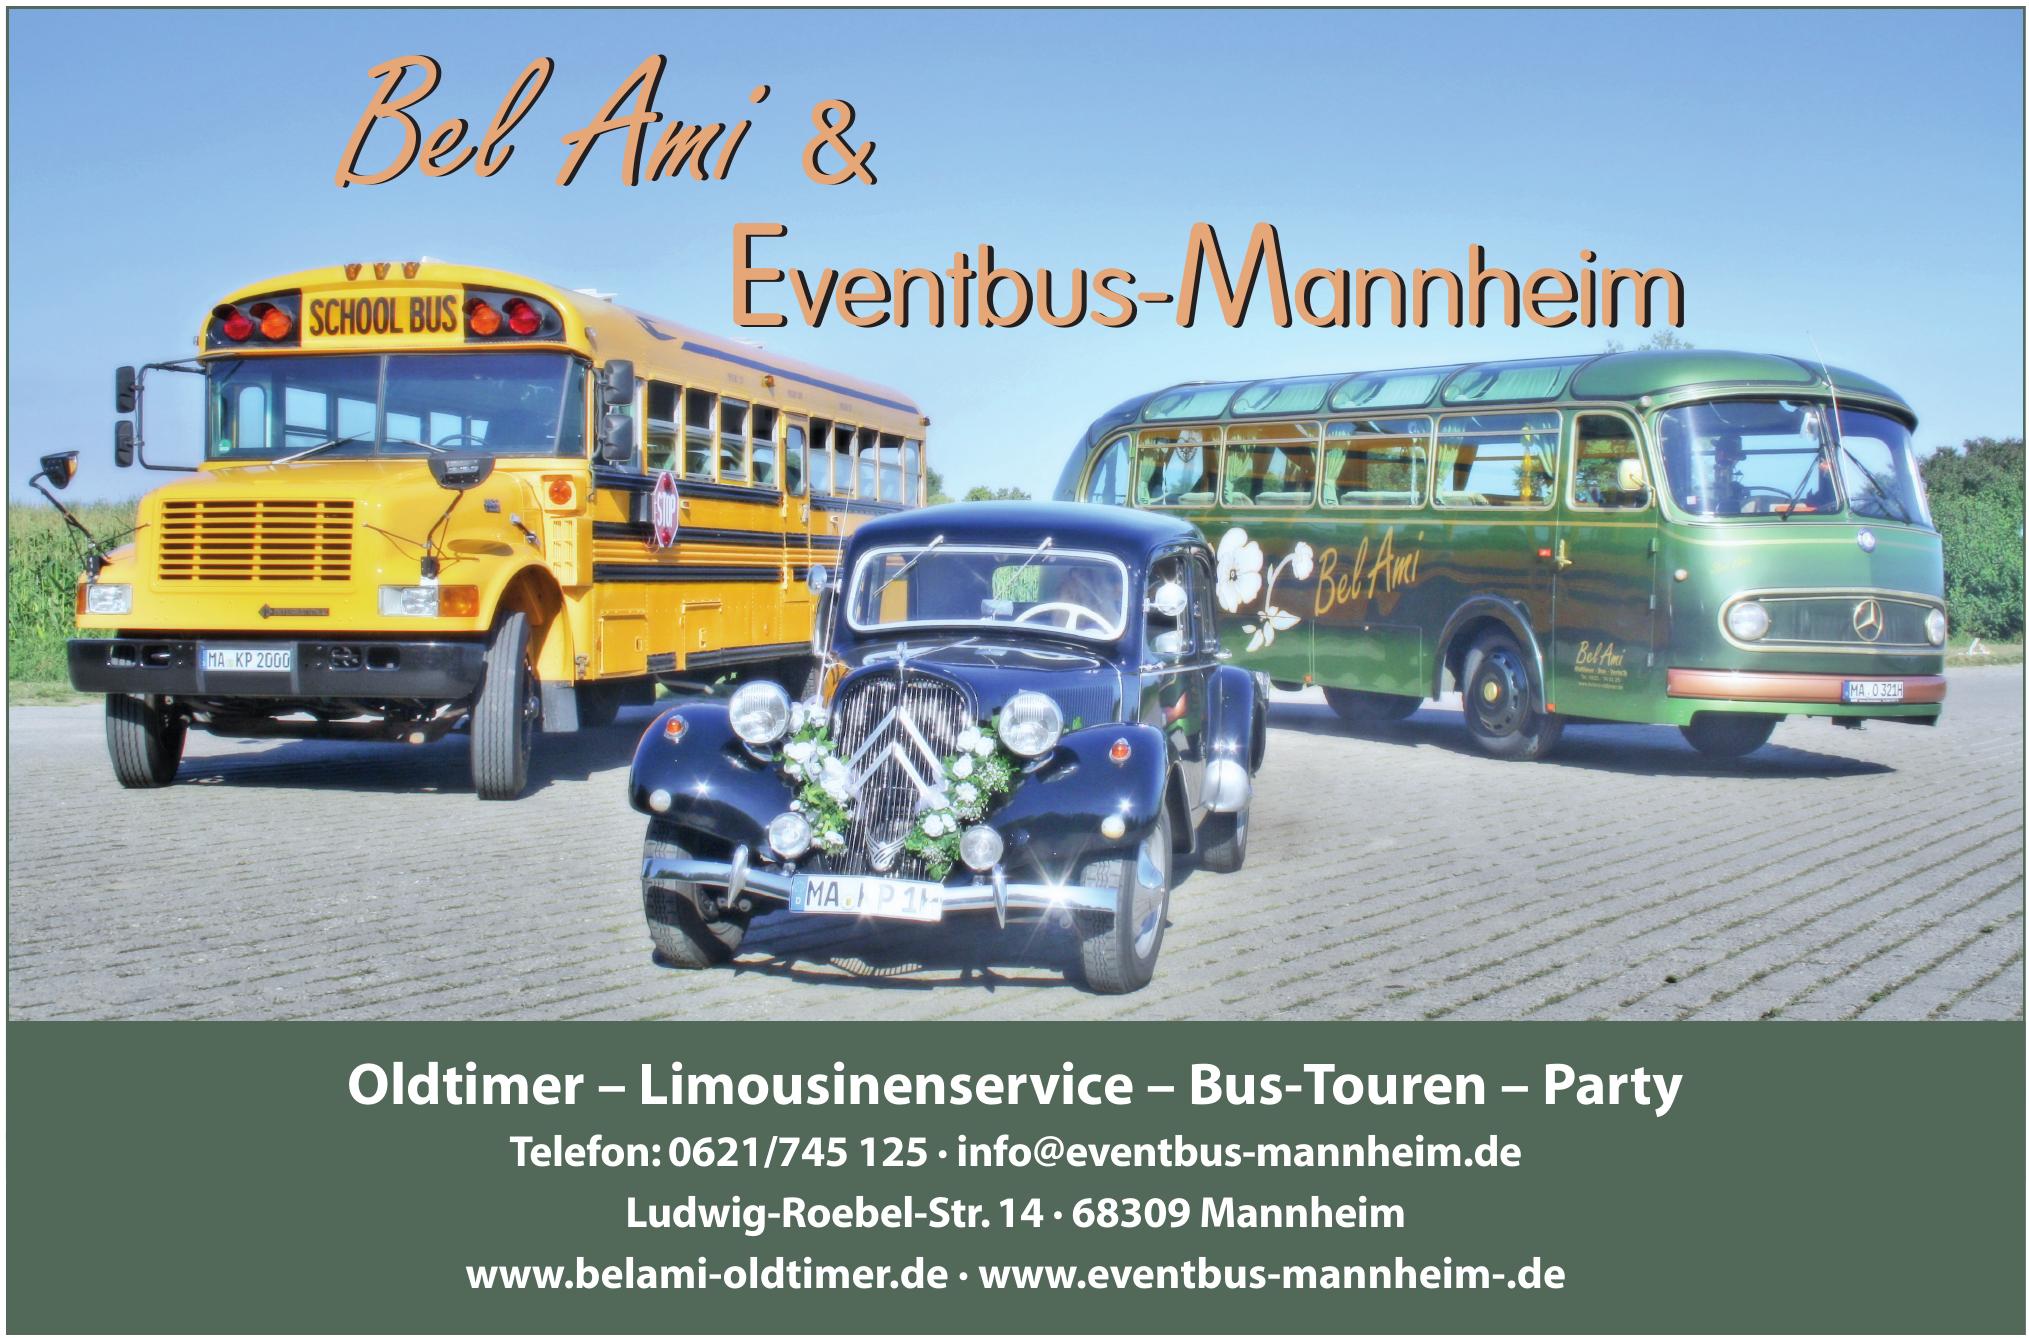 Bel Ami & Eventbus-Mannheim